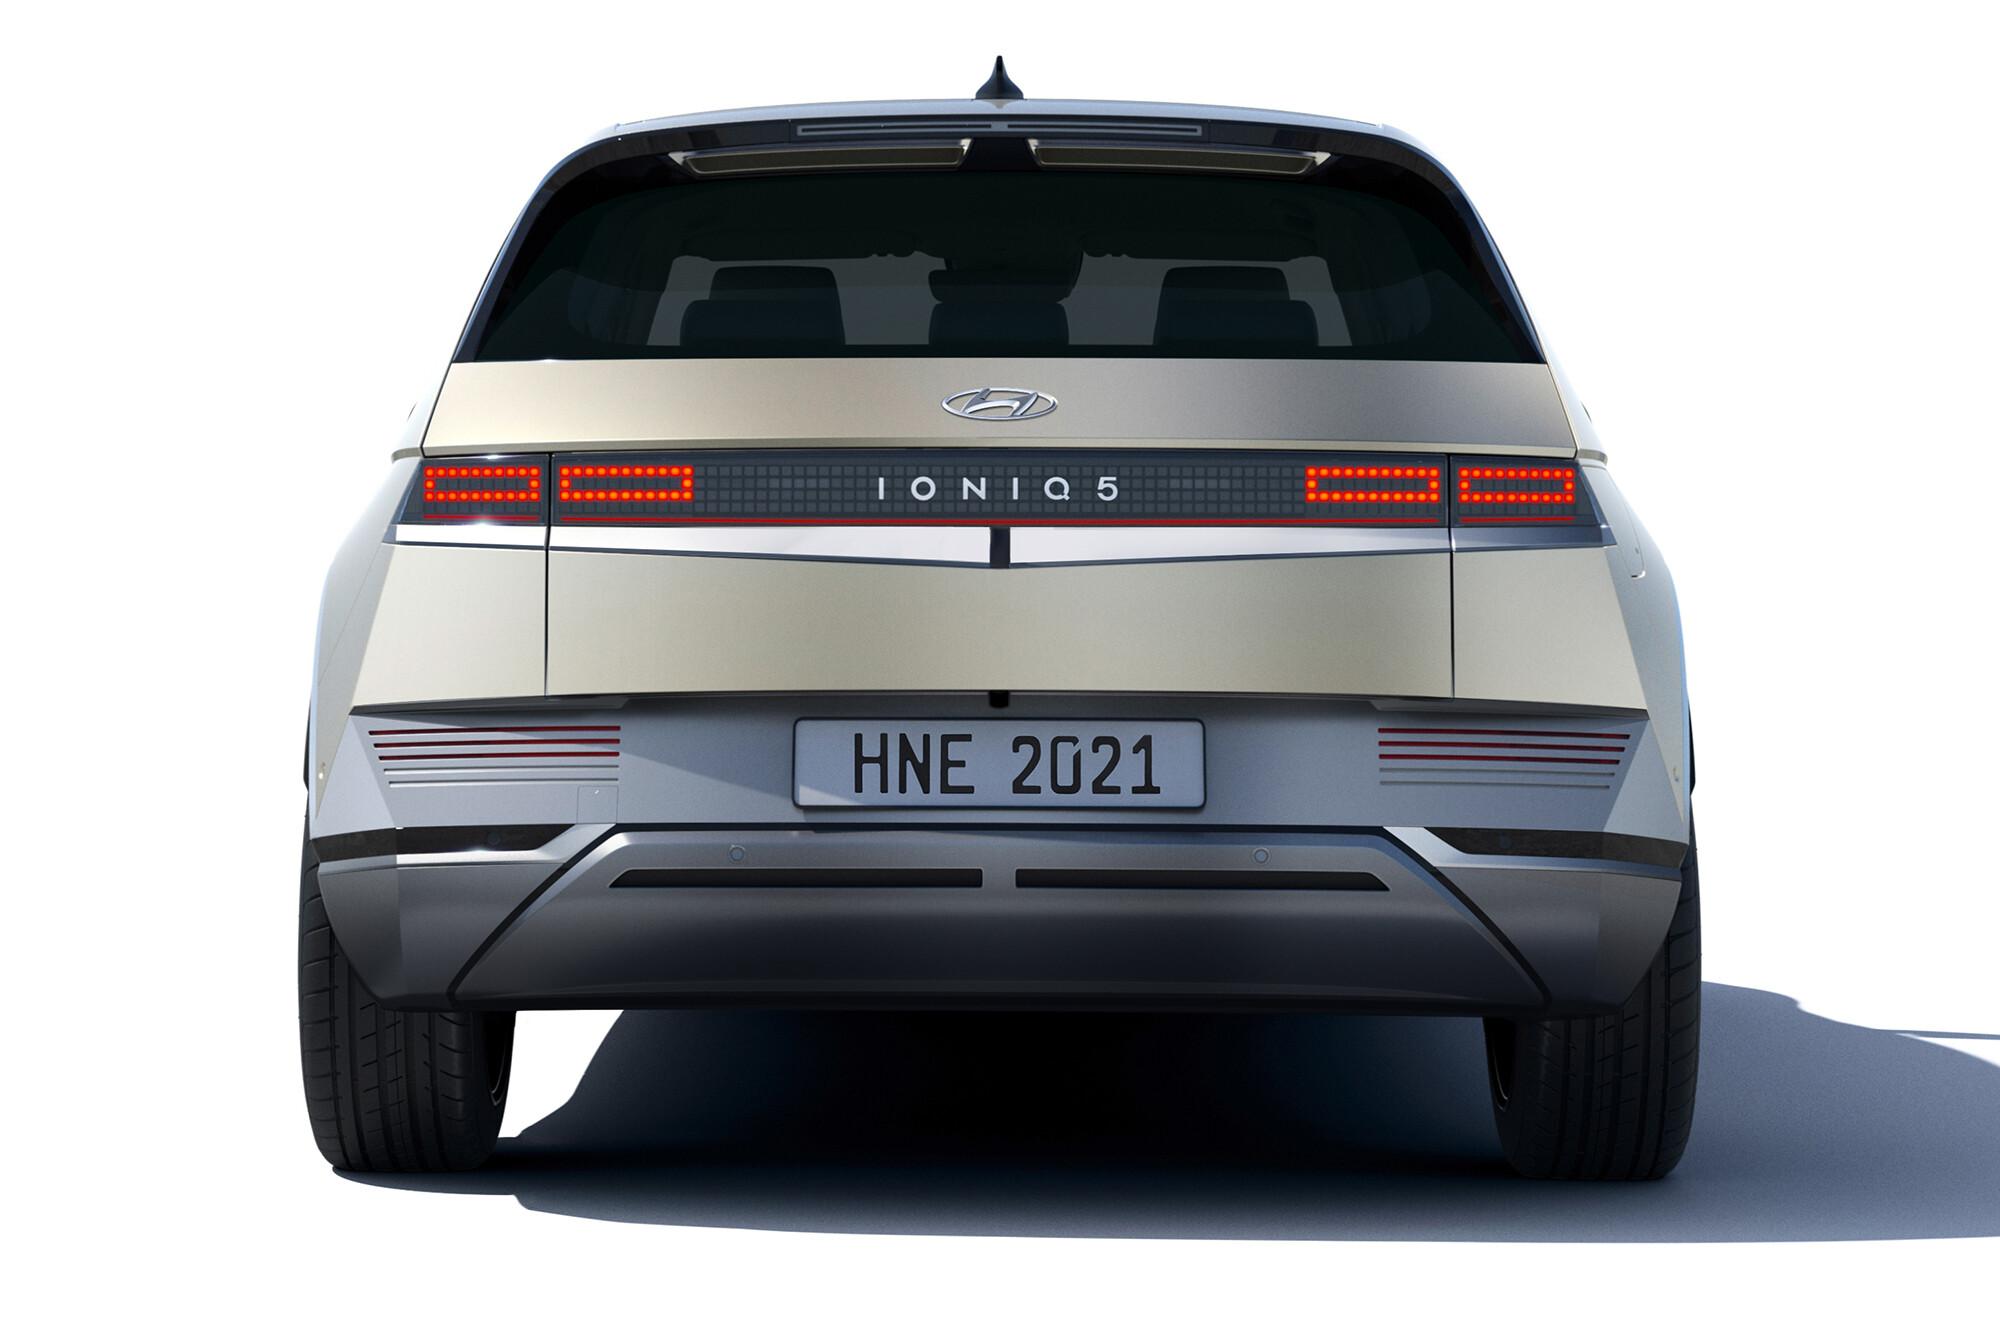 2022 Hyundai Ioniq 5 Electric Vehicle Revealed 18 Jpg